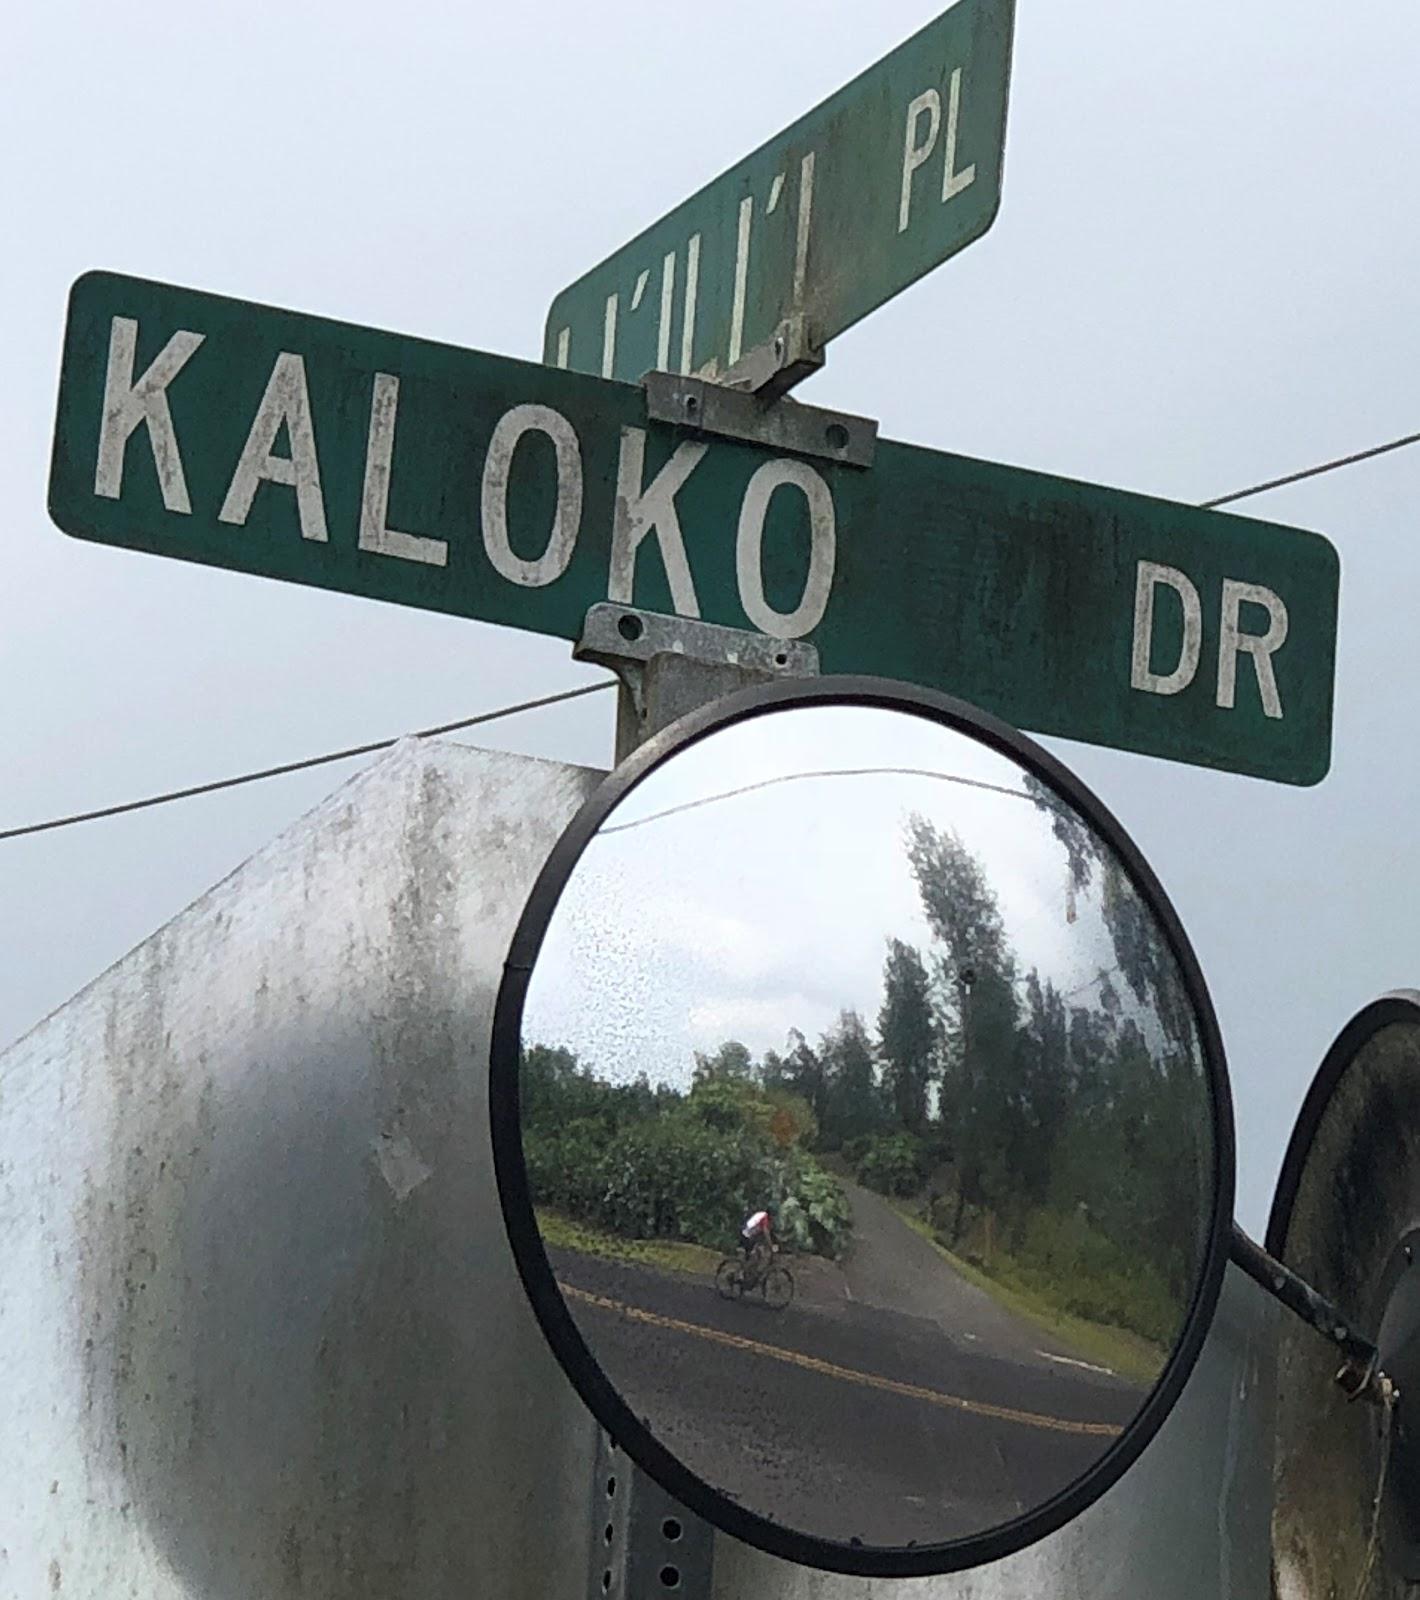 Climbing Kaloko Drive Kailua-Kona by bike.